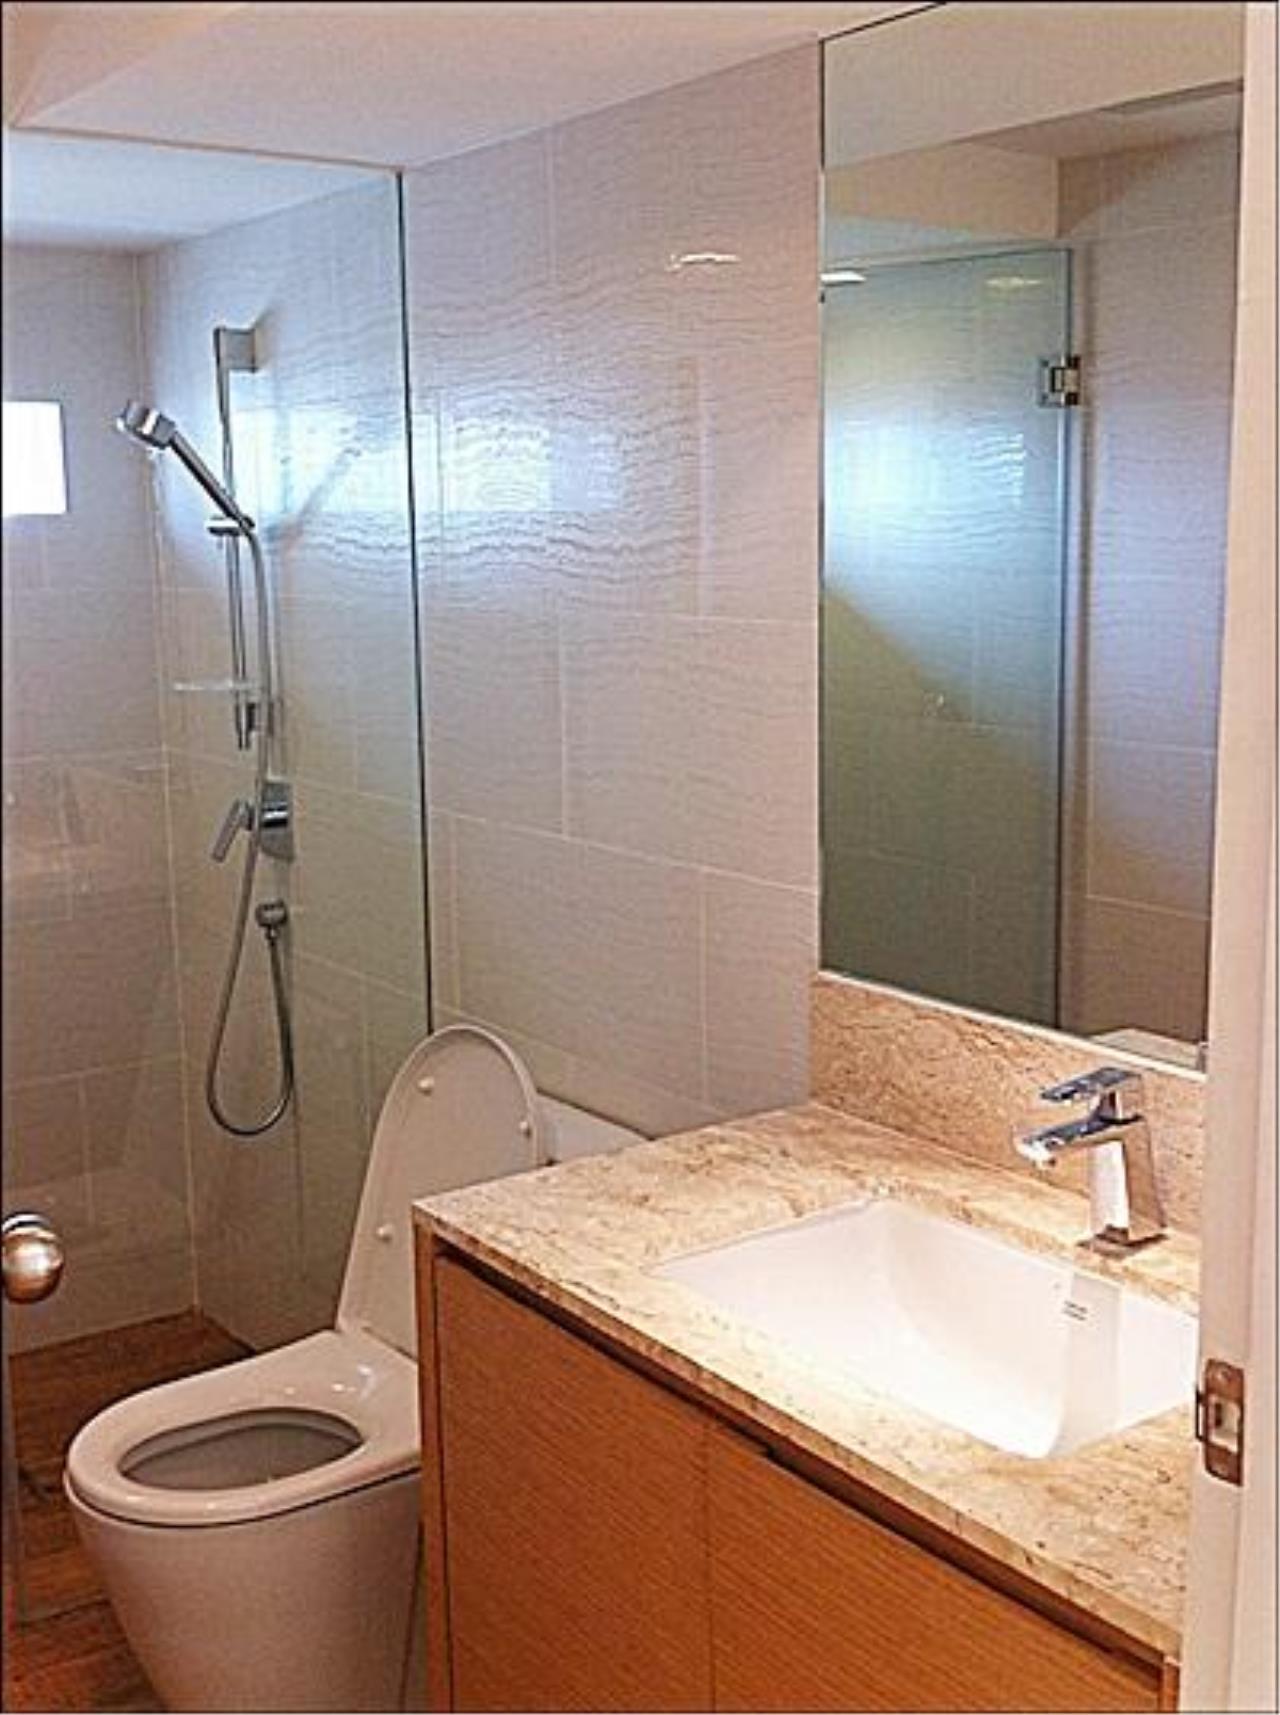 Piri Property Agency's 3 Bedroom Duplex for Sale 19